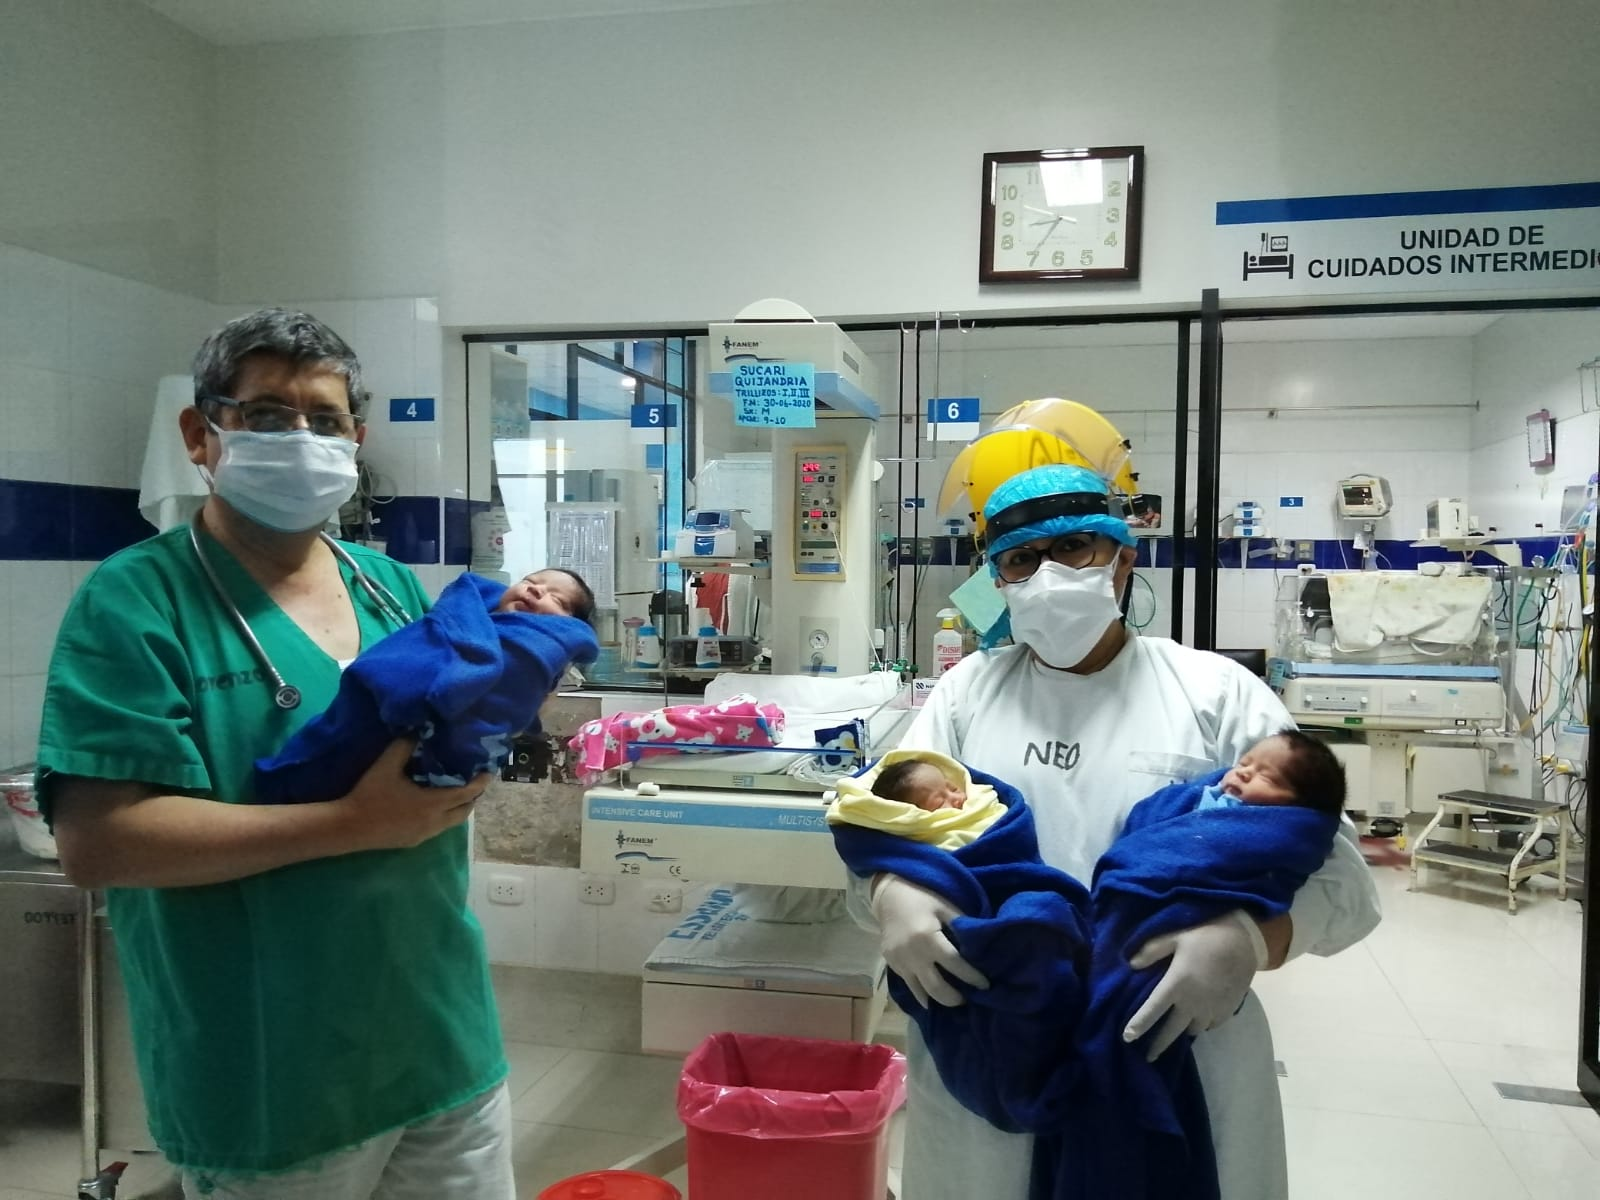 Essalud - Nacen trillizos en EsSalud Áncash, mediante cesárea